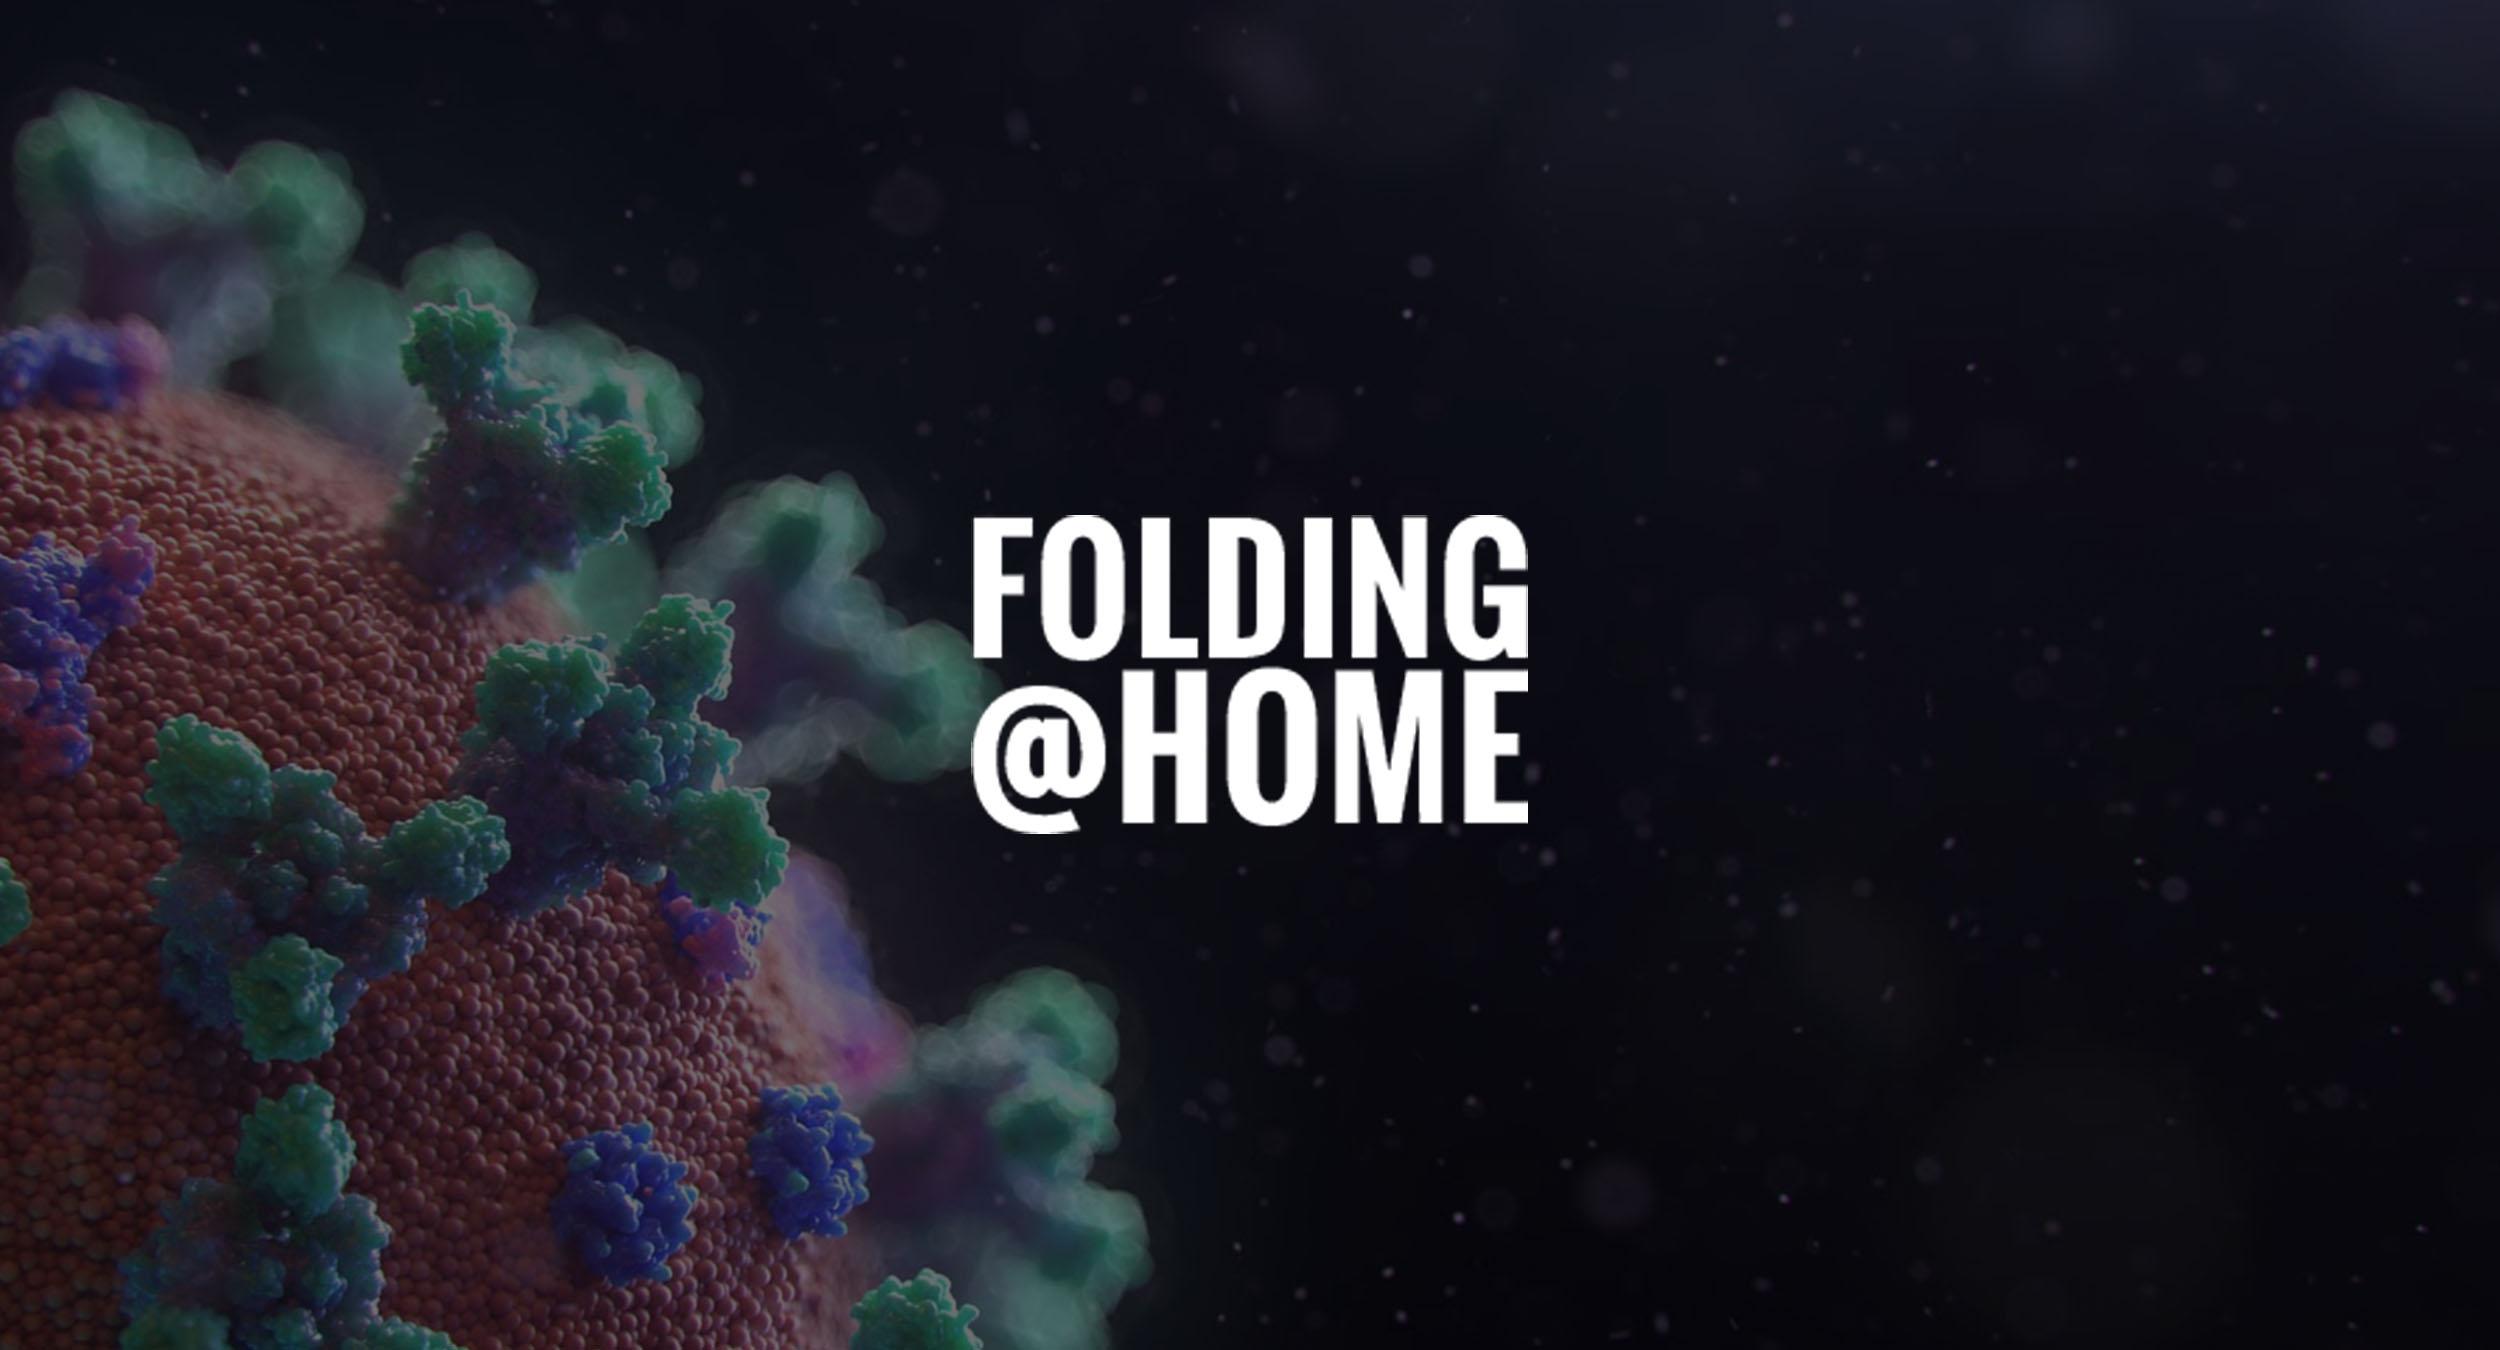 folding@home-parallax